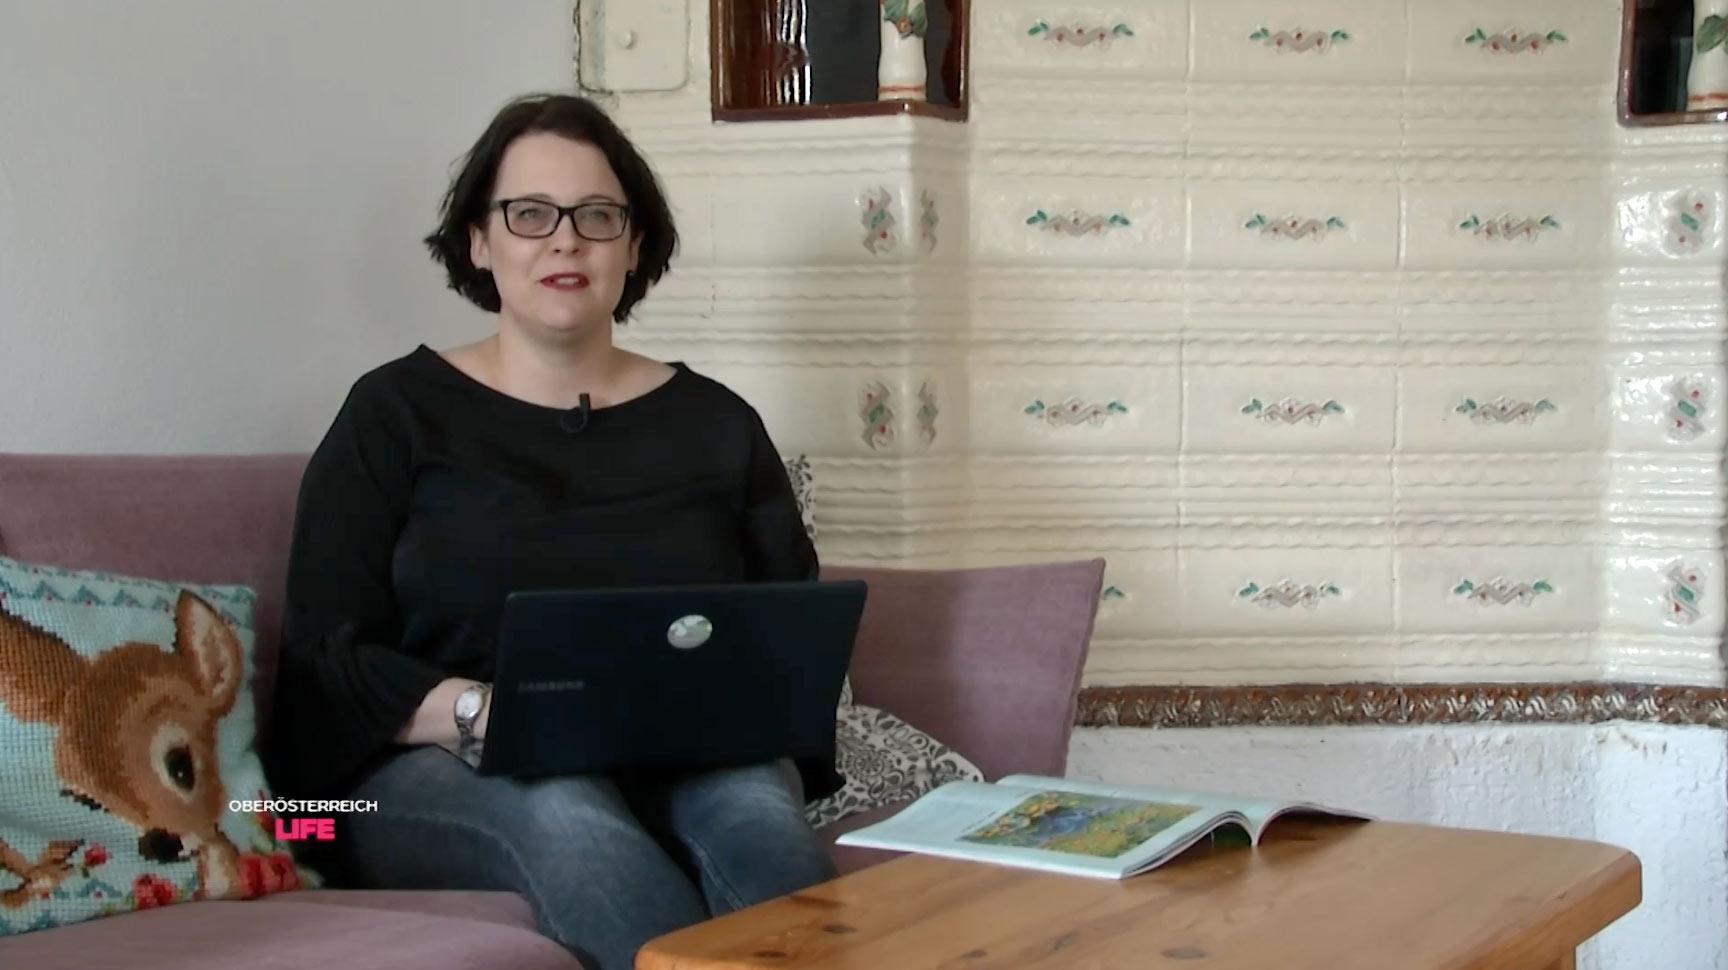 Altheim singlebrsen Sexkontakt nora barthel